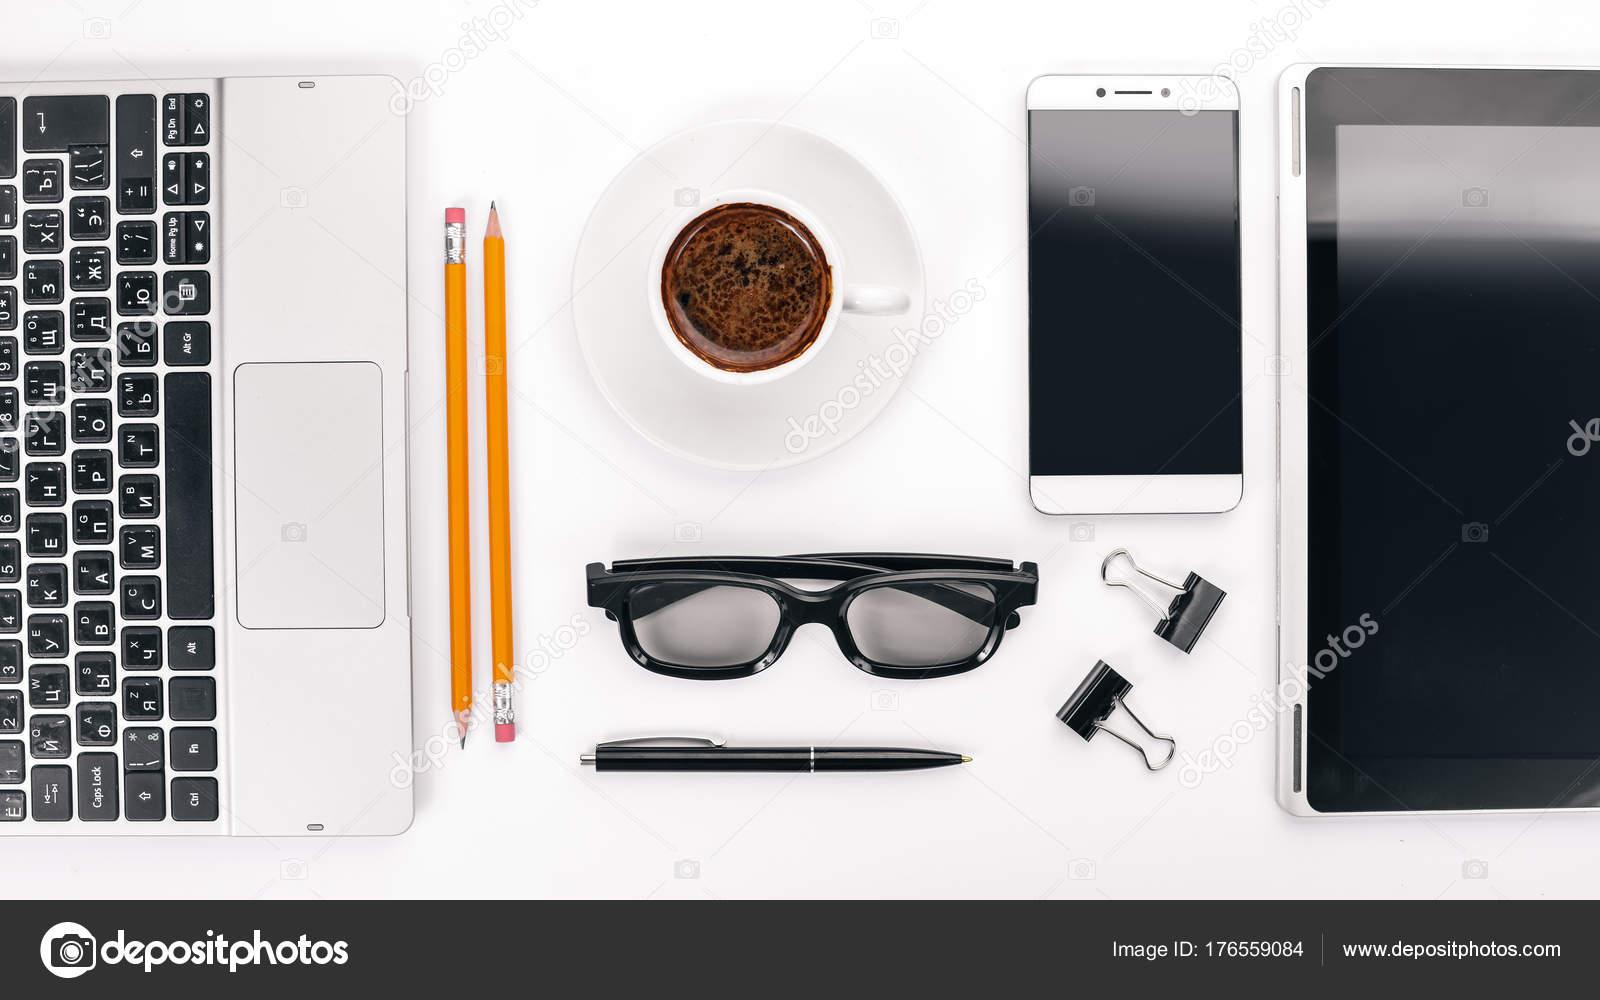 40ad20e3469e7a Witte Bureau Laptop Telefoon Kopje Koffie Bril Pen Potlood Een — Stockfoto